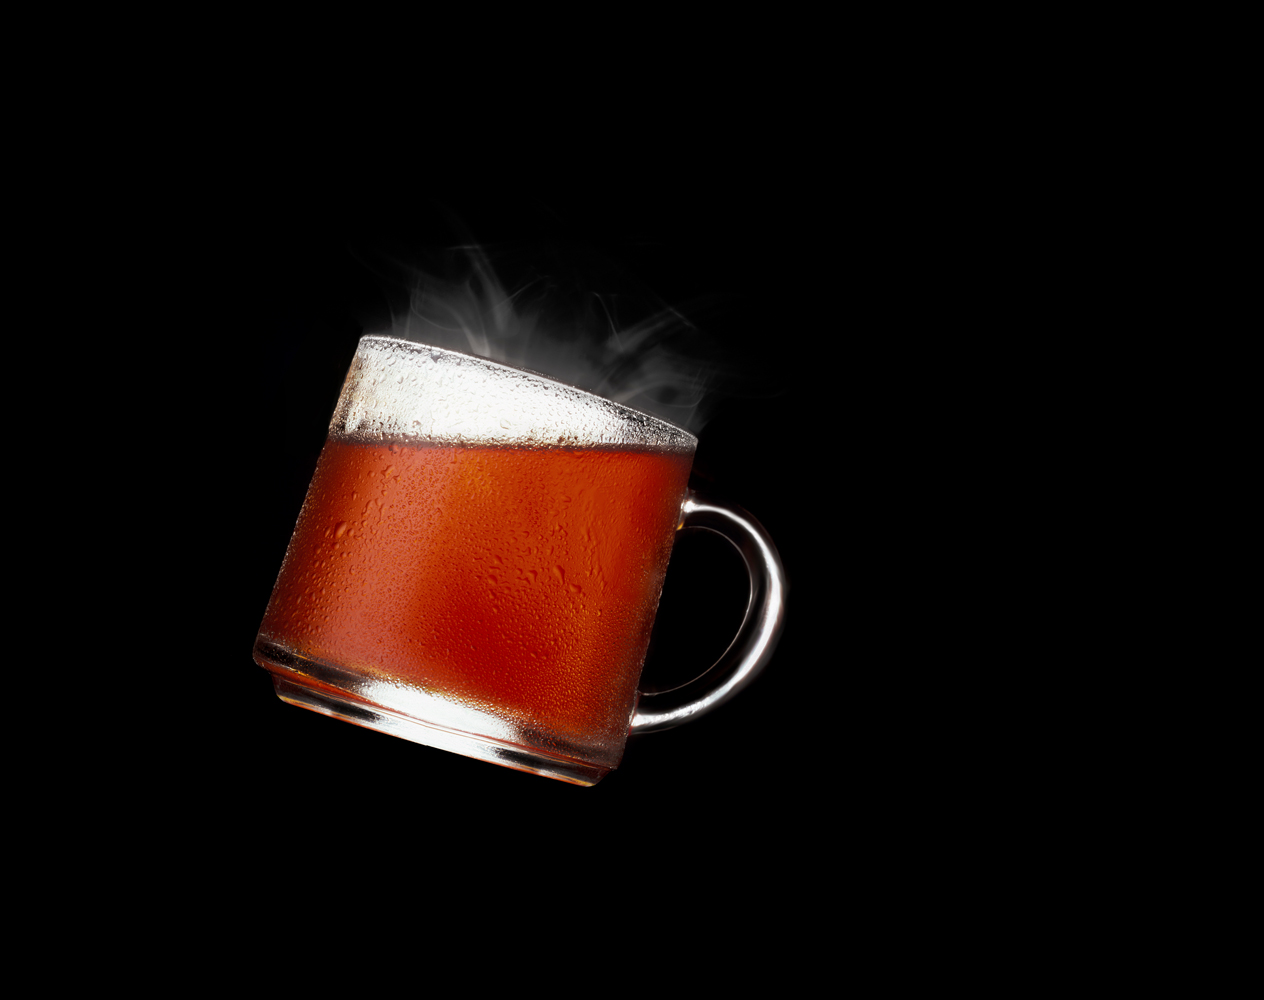 tea in a glass cup steaming...132.jpg